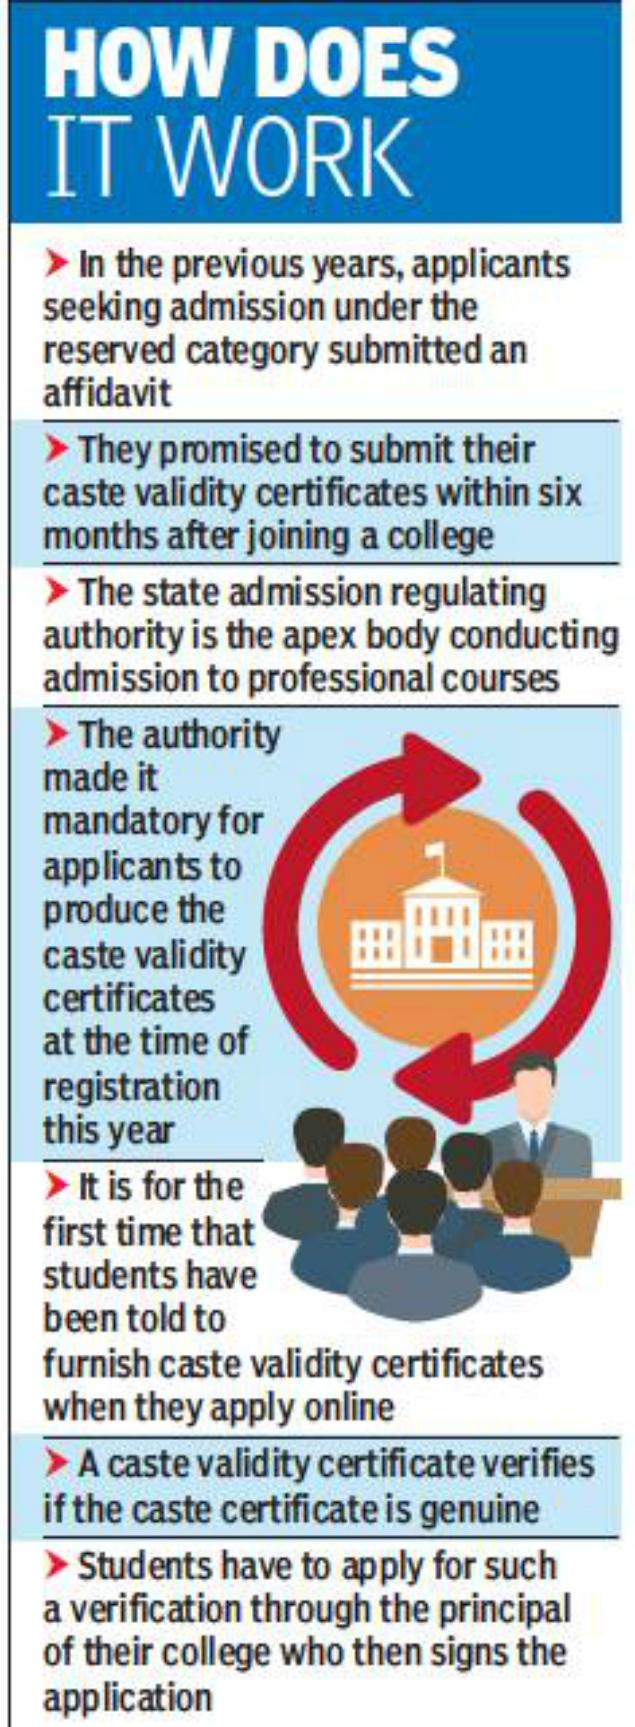 Mandatory caste validity certificate: Mandatory caste